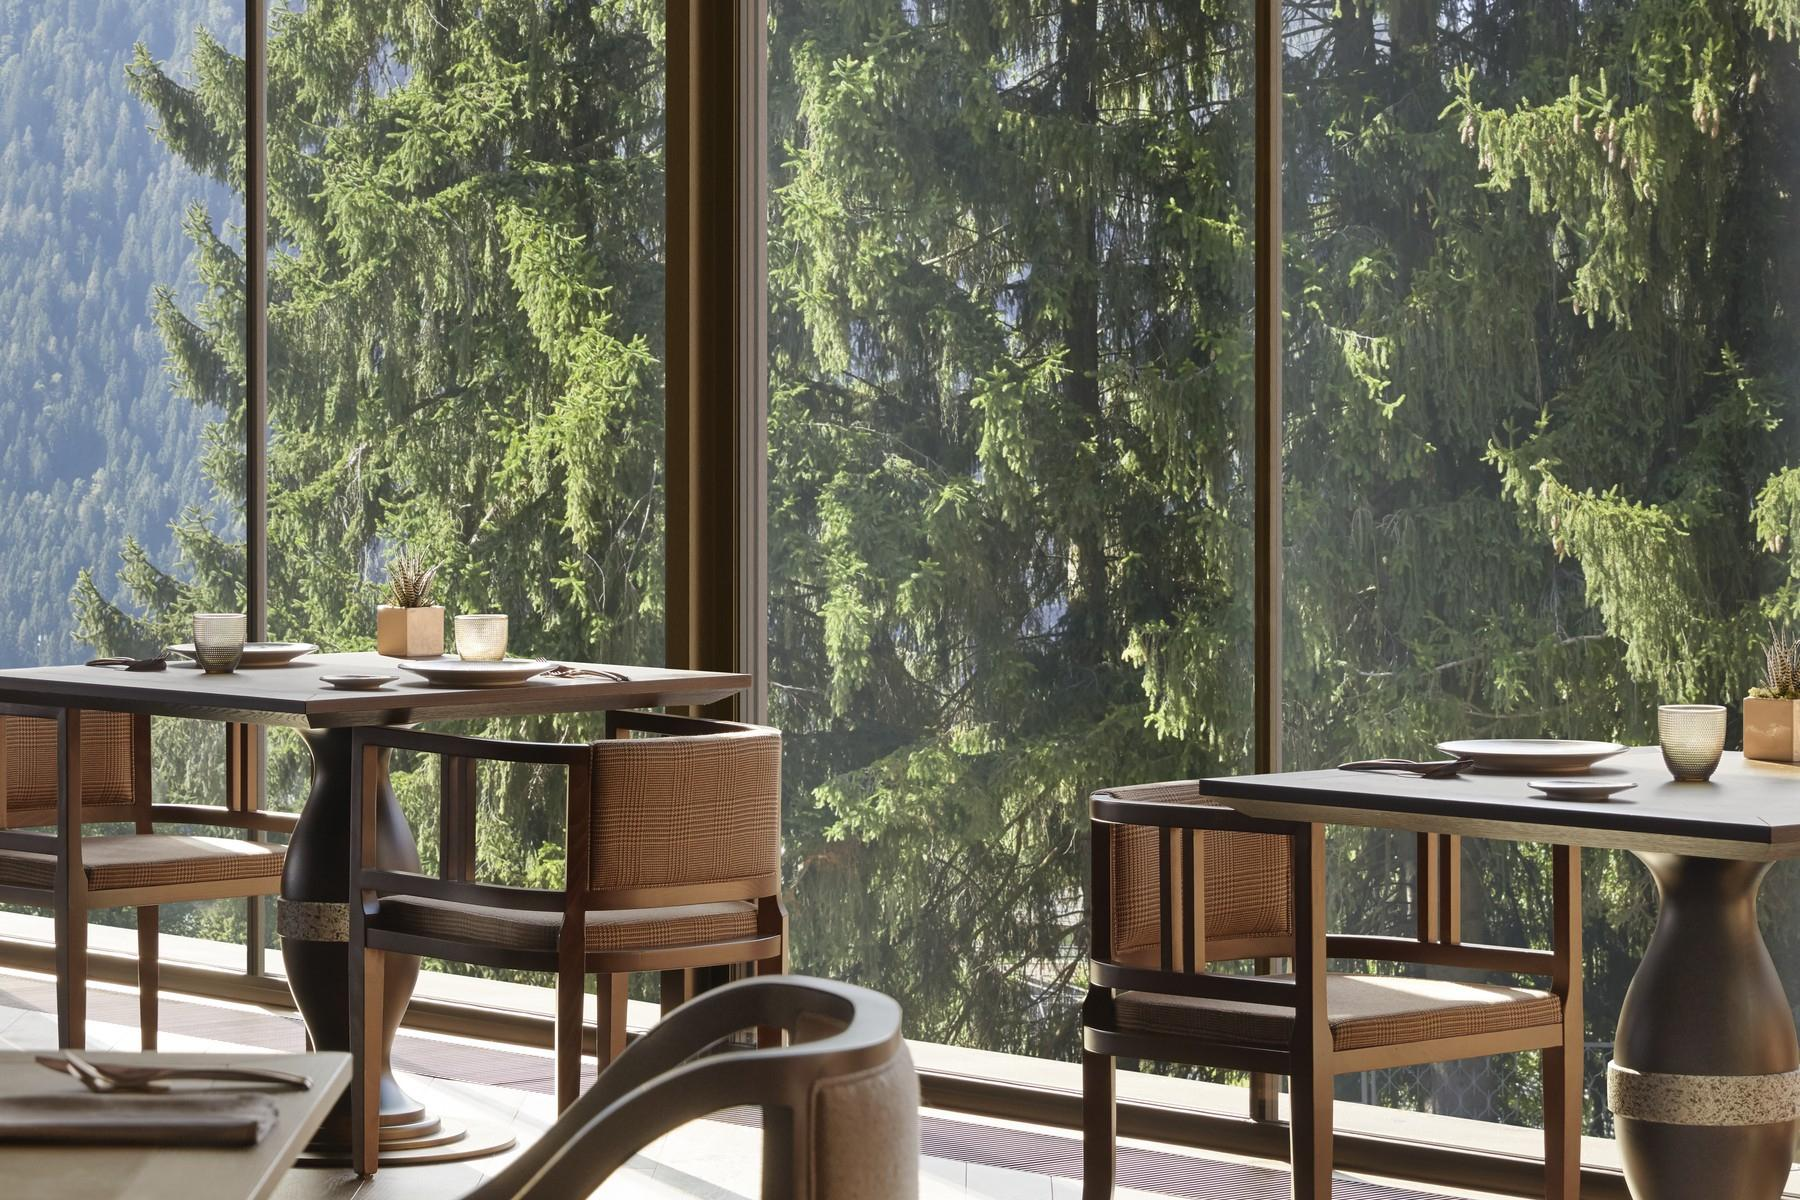 Splendide residenze di lusso sulle Dolomiti - 27